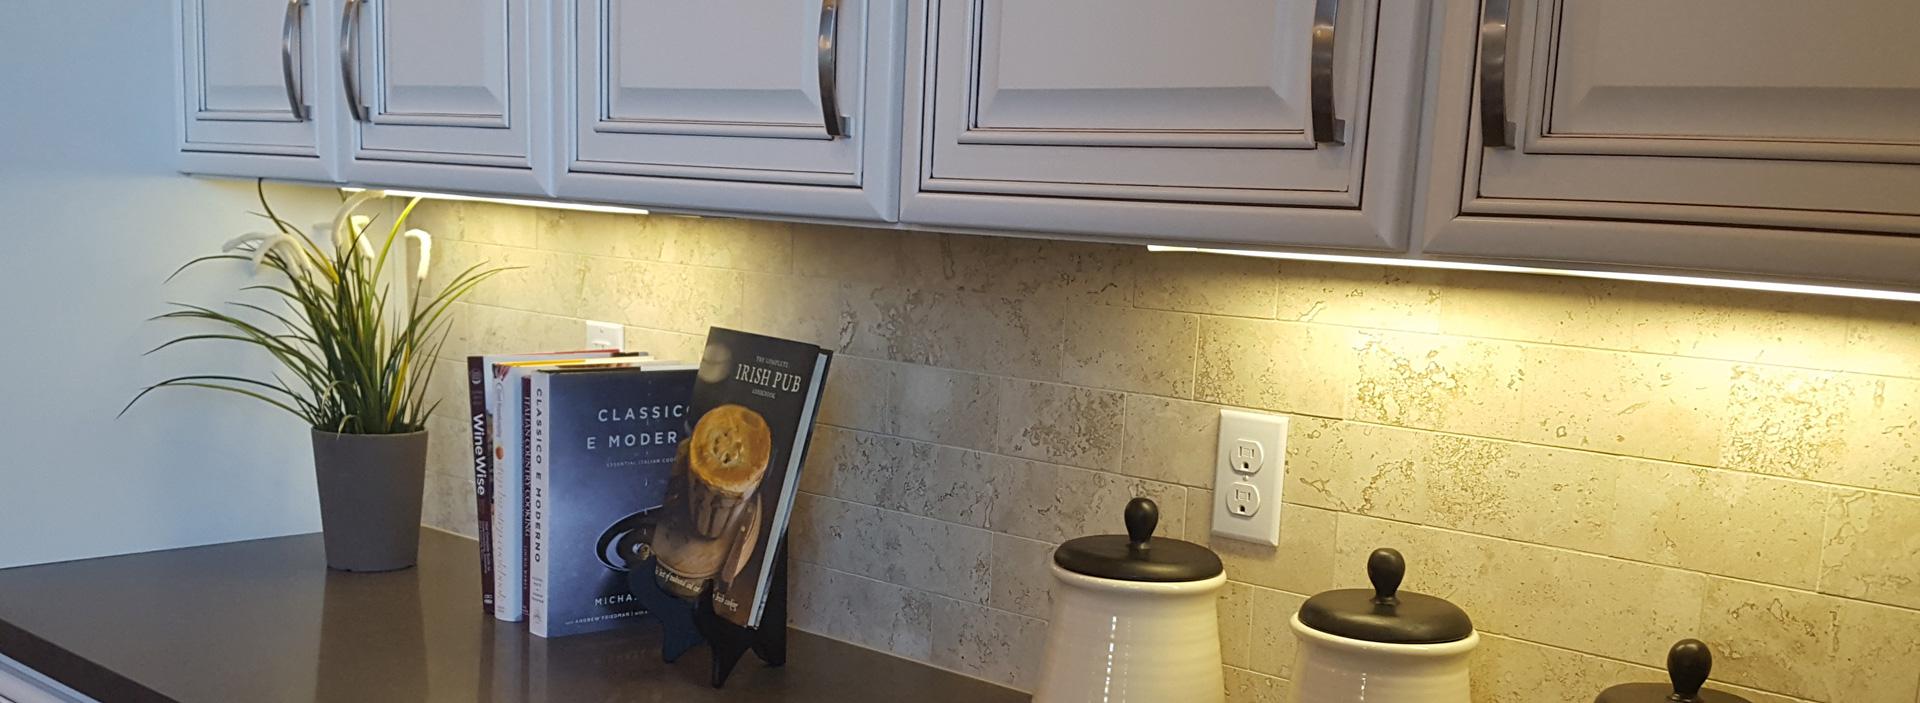 under cabinet lighting ideas for best